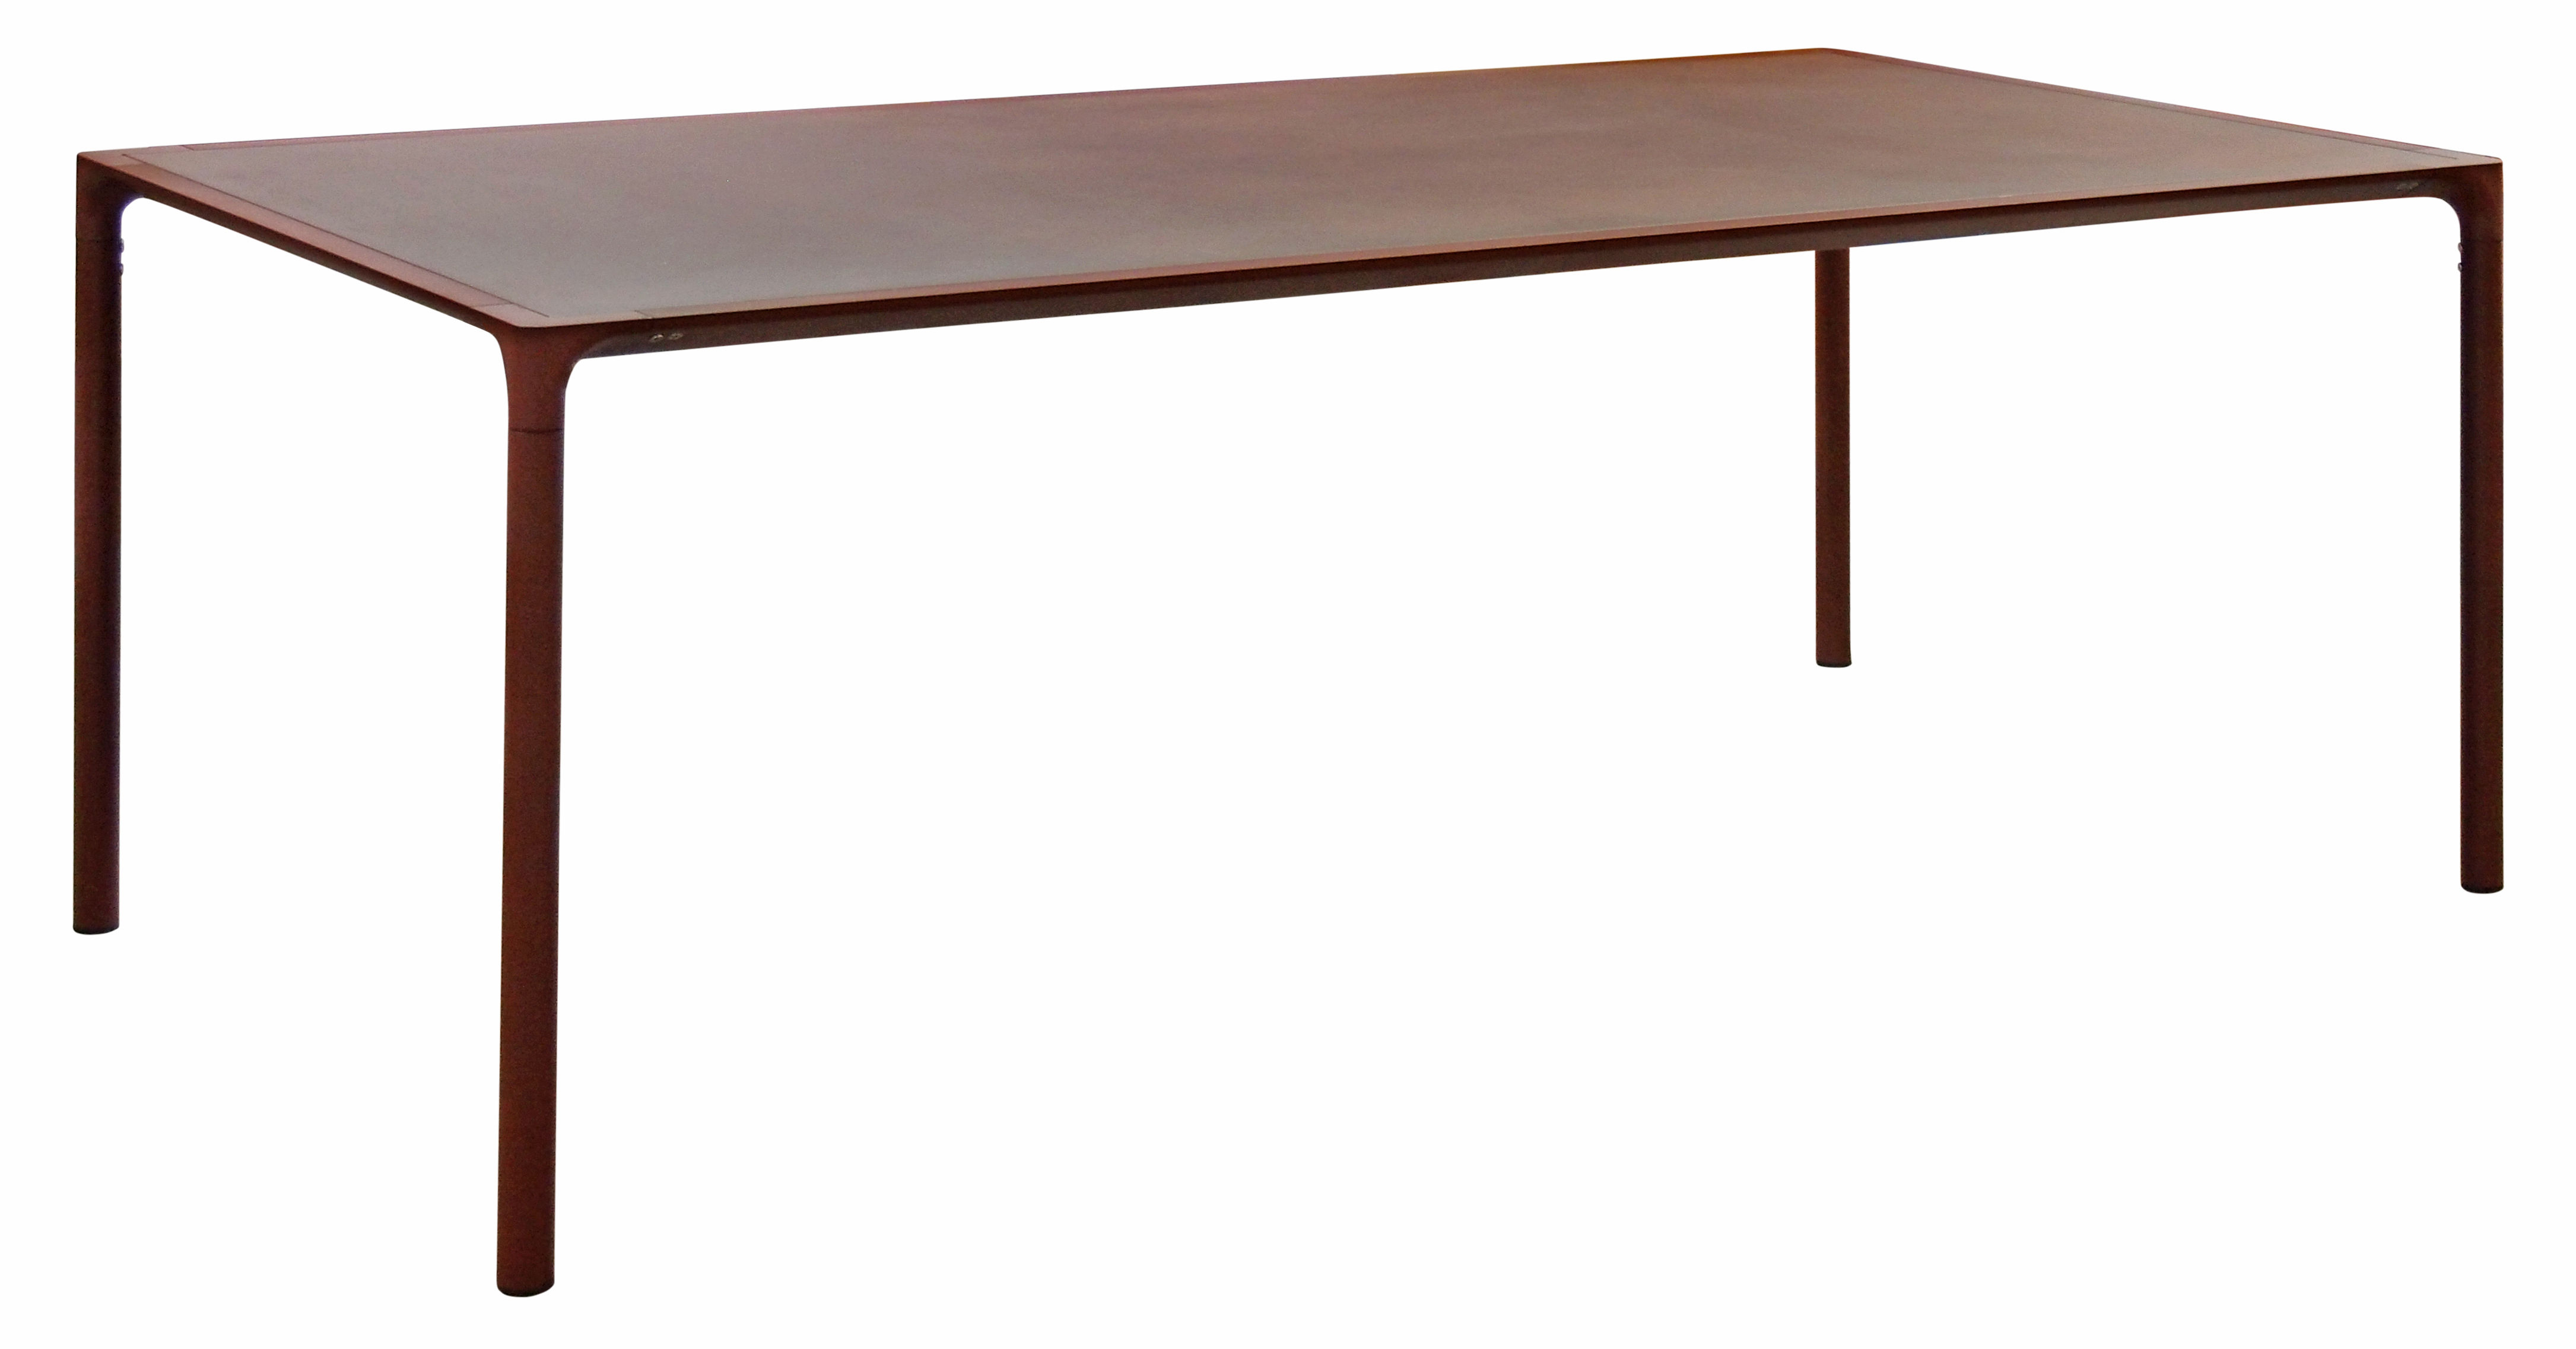 Jardin - Tables de jardin - Table Terramare / Métal effet rouille - 203 x 103 cm - Emu - Corten (effet rouille) - Aluminium verni